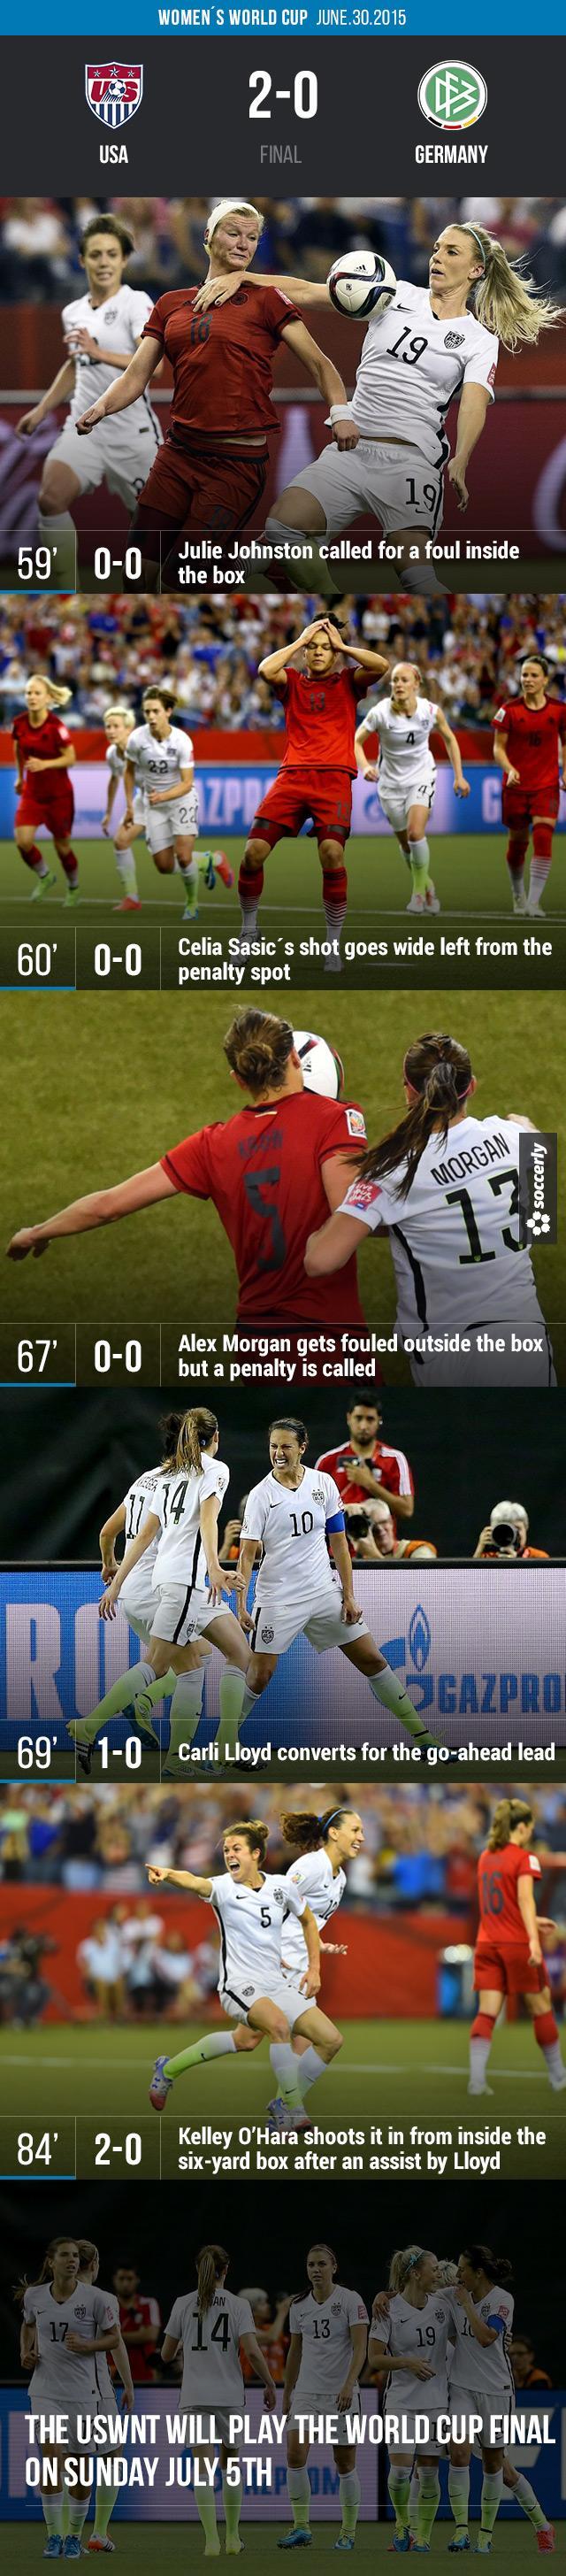 USA vs Germany, Semifinal, Women´s World Cup